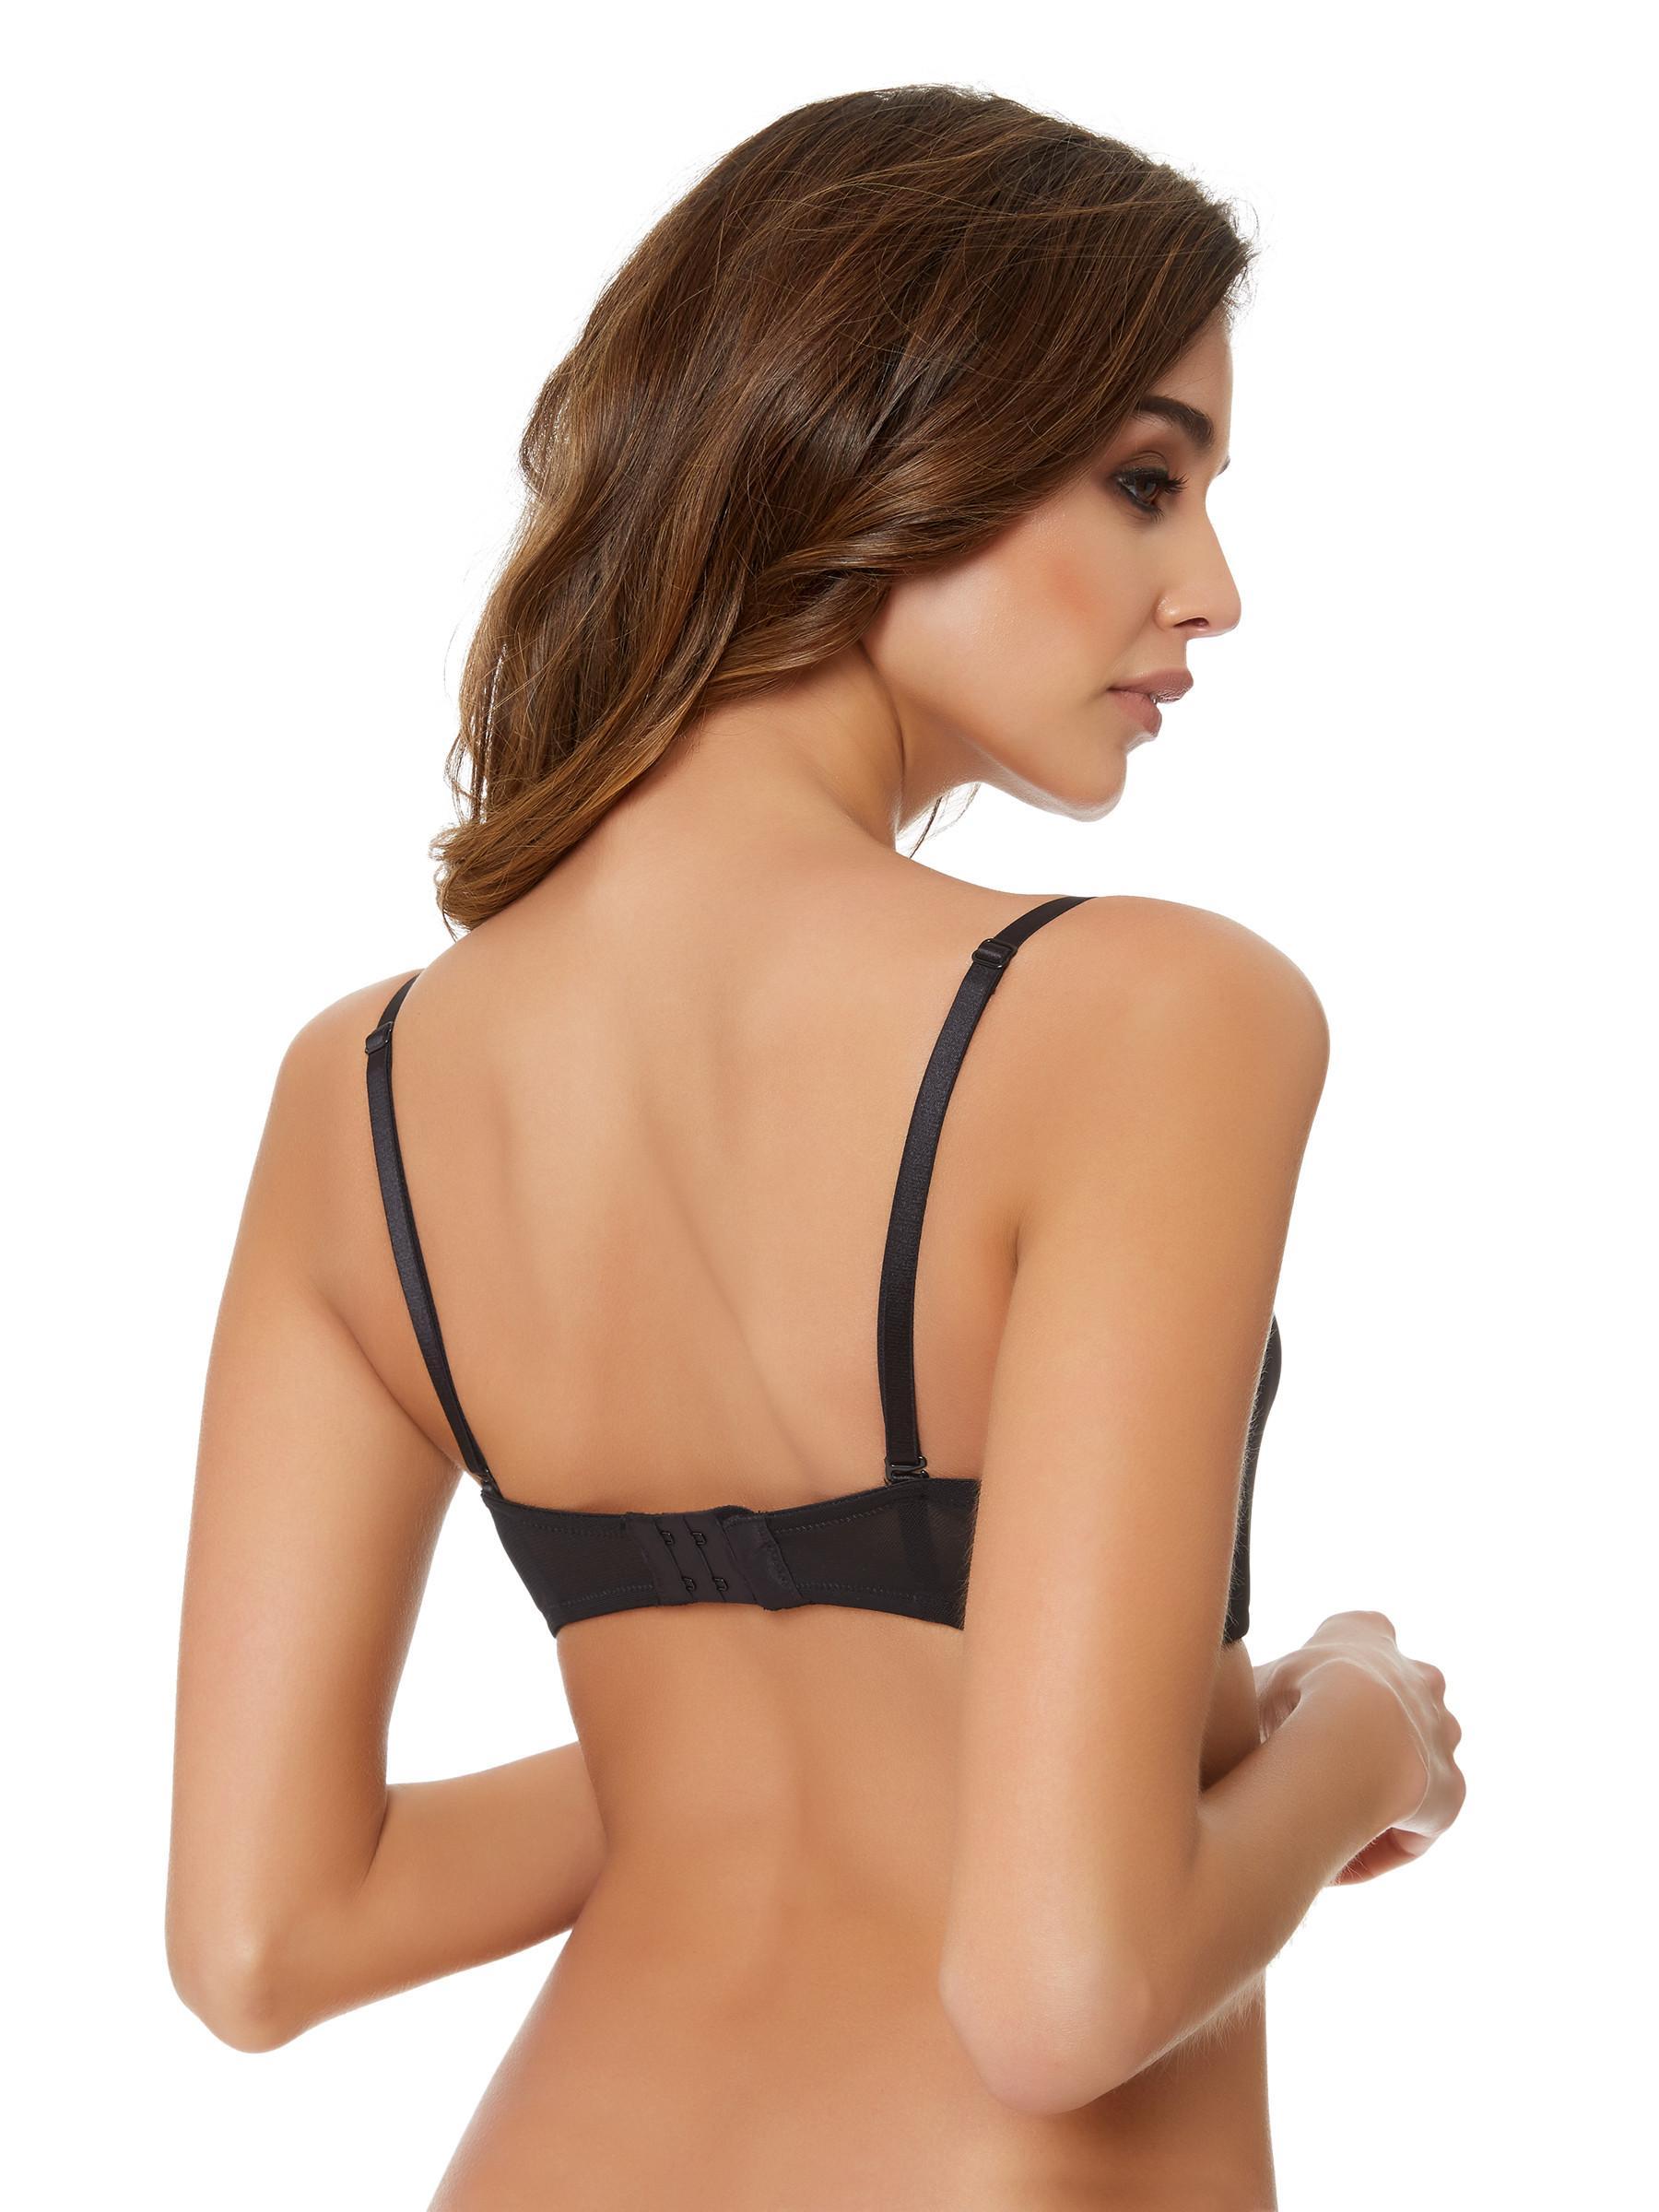 92697aaea9c17 Ann Summers Womens Harper Strapless Bra Padded Underwired Lingerie Underwear